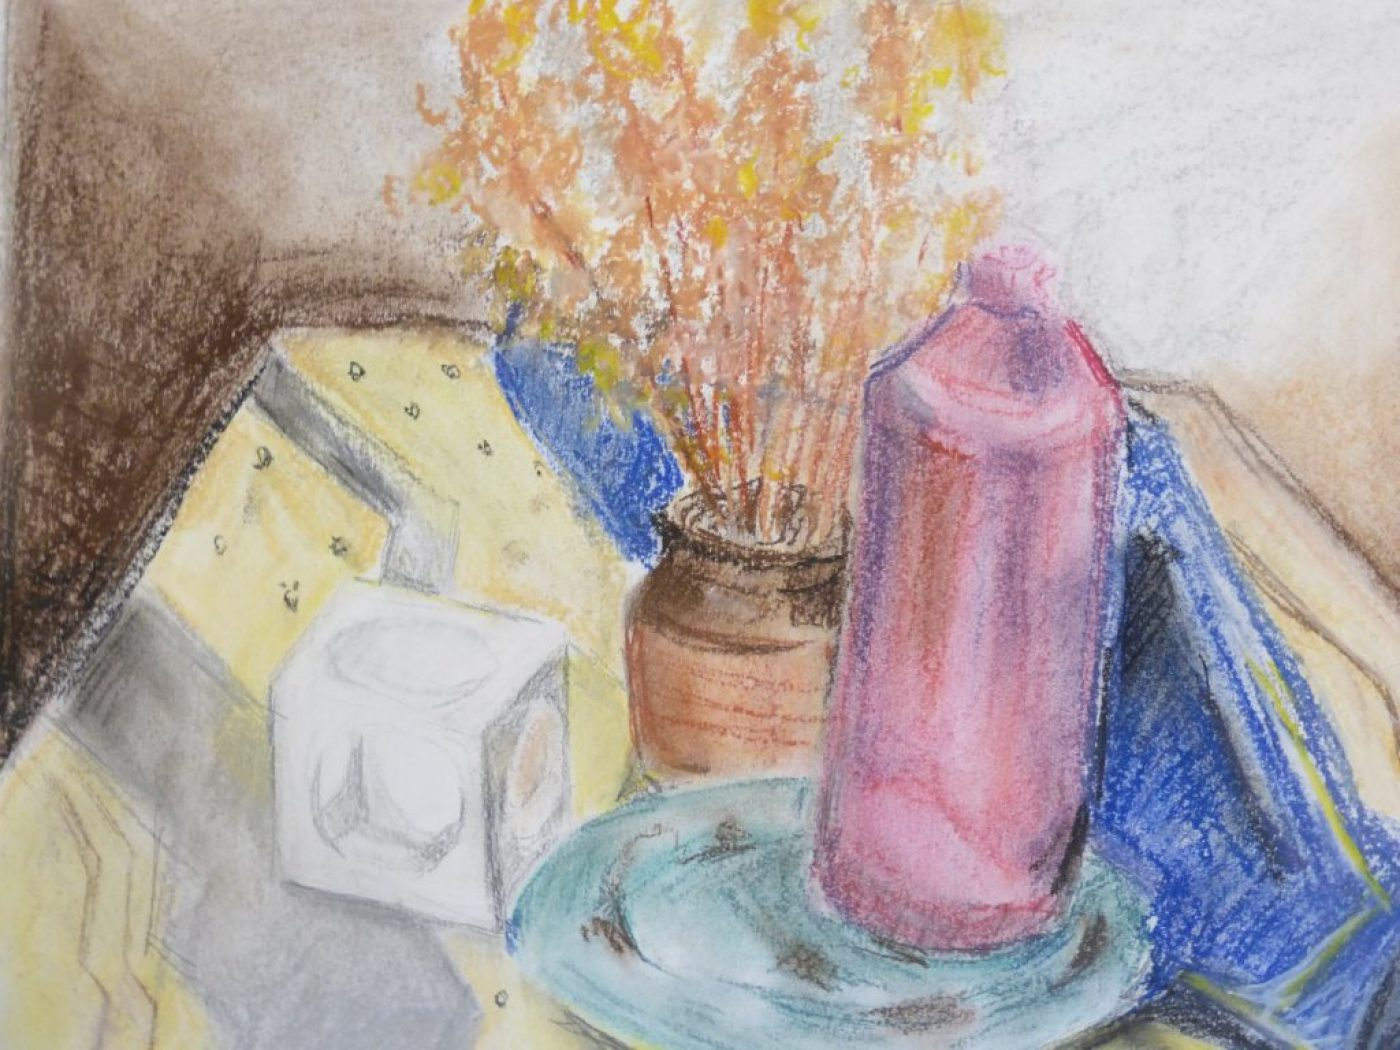 The Art Elements